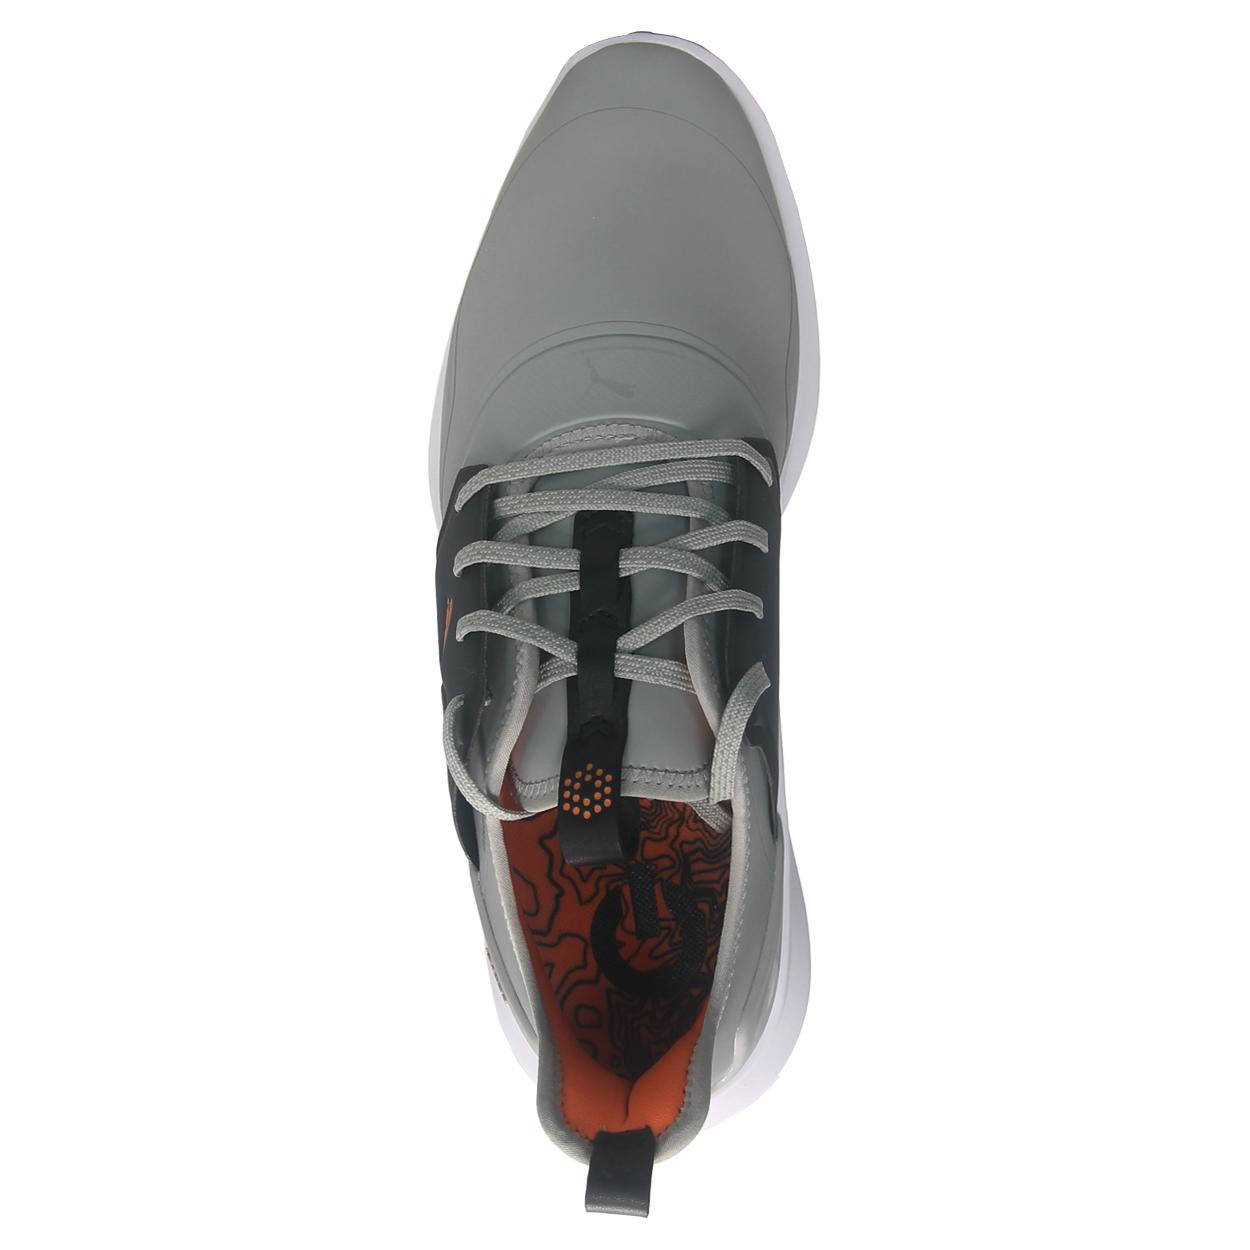 Puma Men S Ignite Nxt Pro Spikeless Waterproof Golf Shoe Brand New Ebay